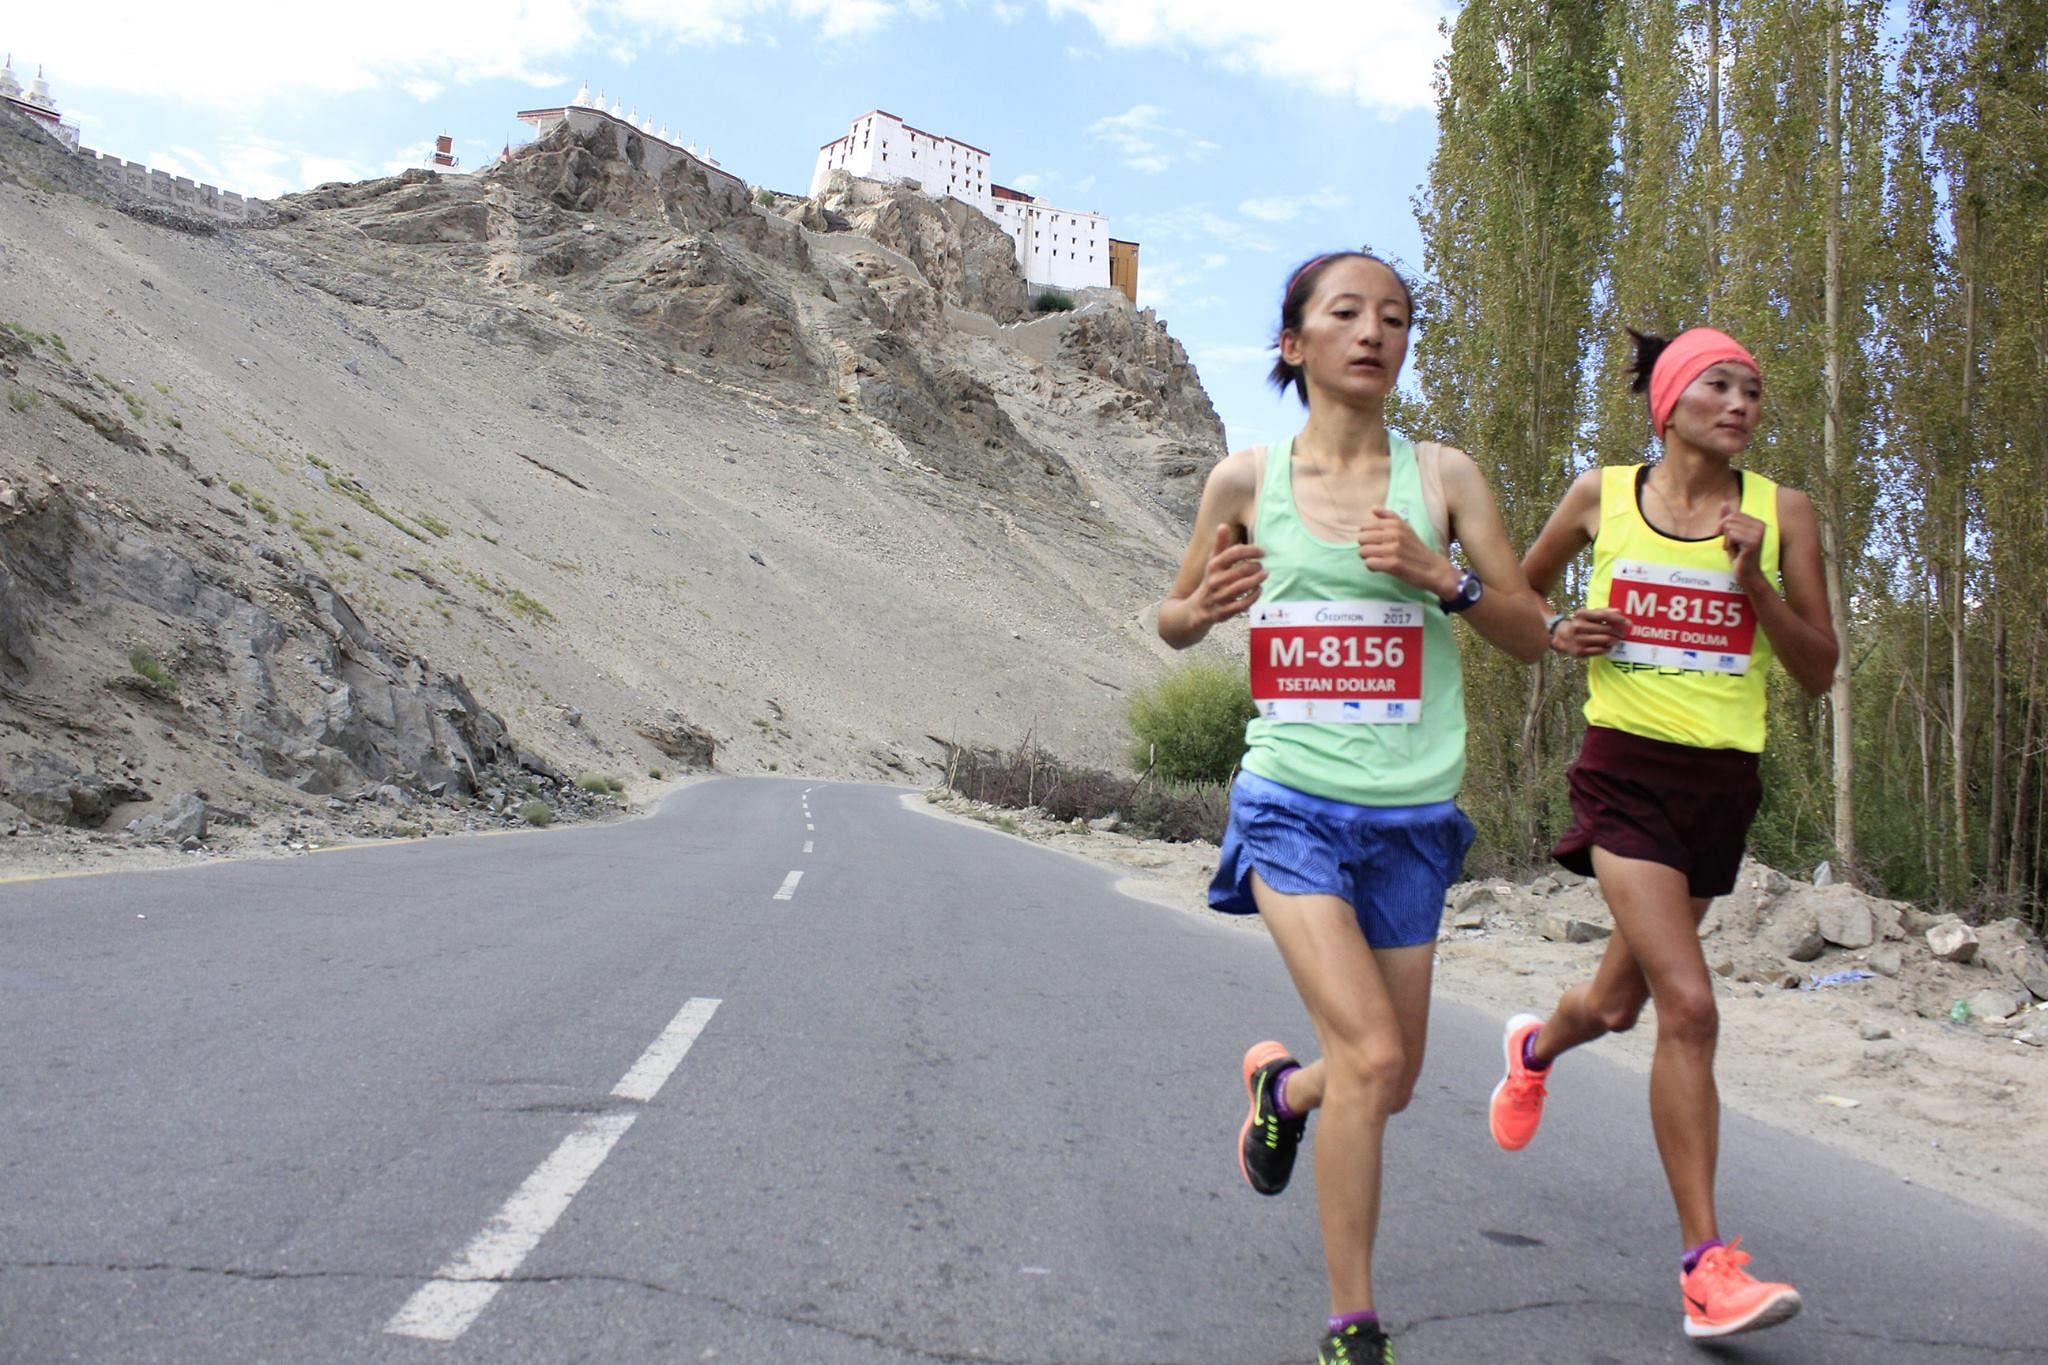 Jigmet Dolma (Right) and Tsetan Dolkar running for a better life and running for Ladakh. (Source: Facebook/Ladakh Marathon)